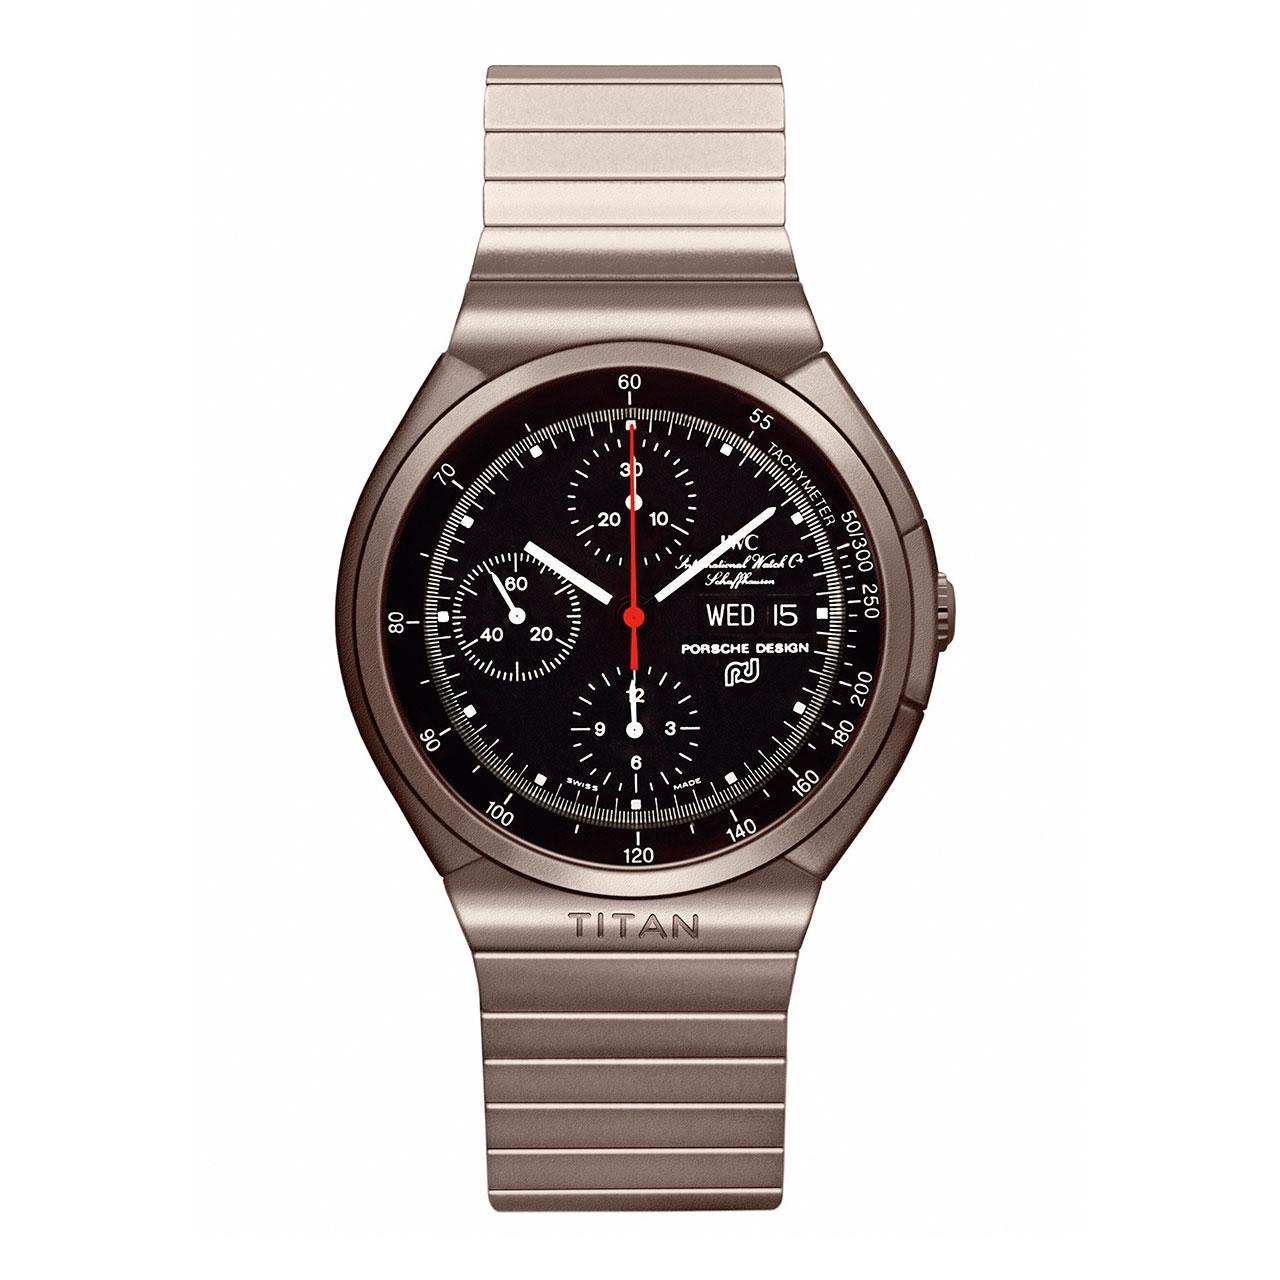 timepieces made by Porsche Design